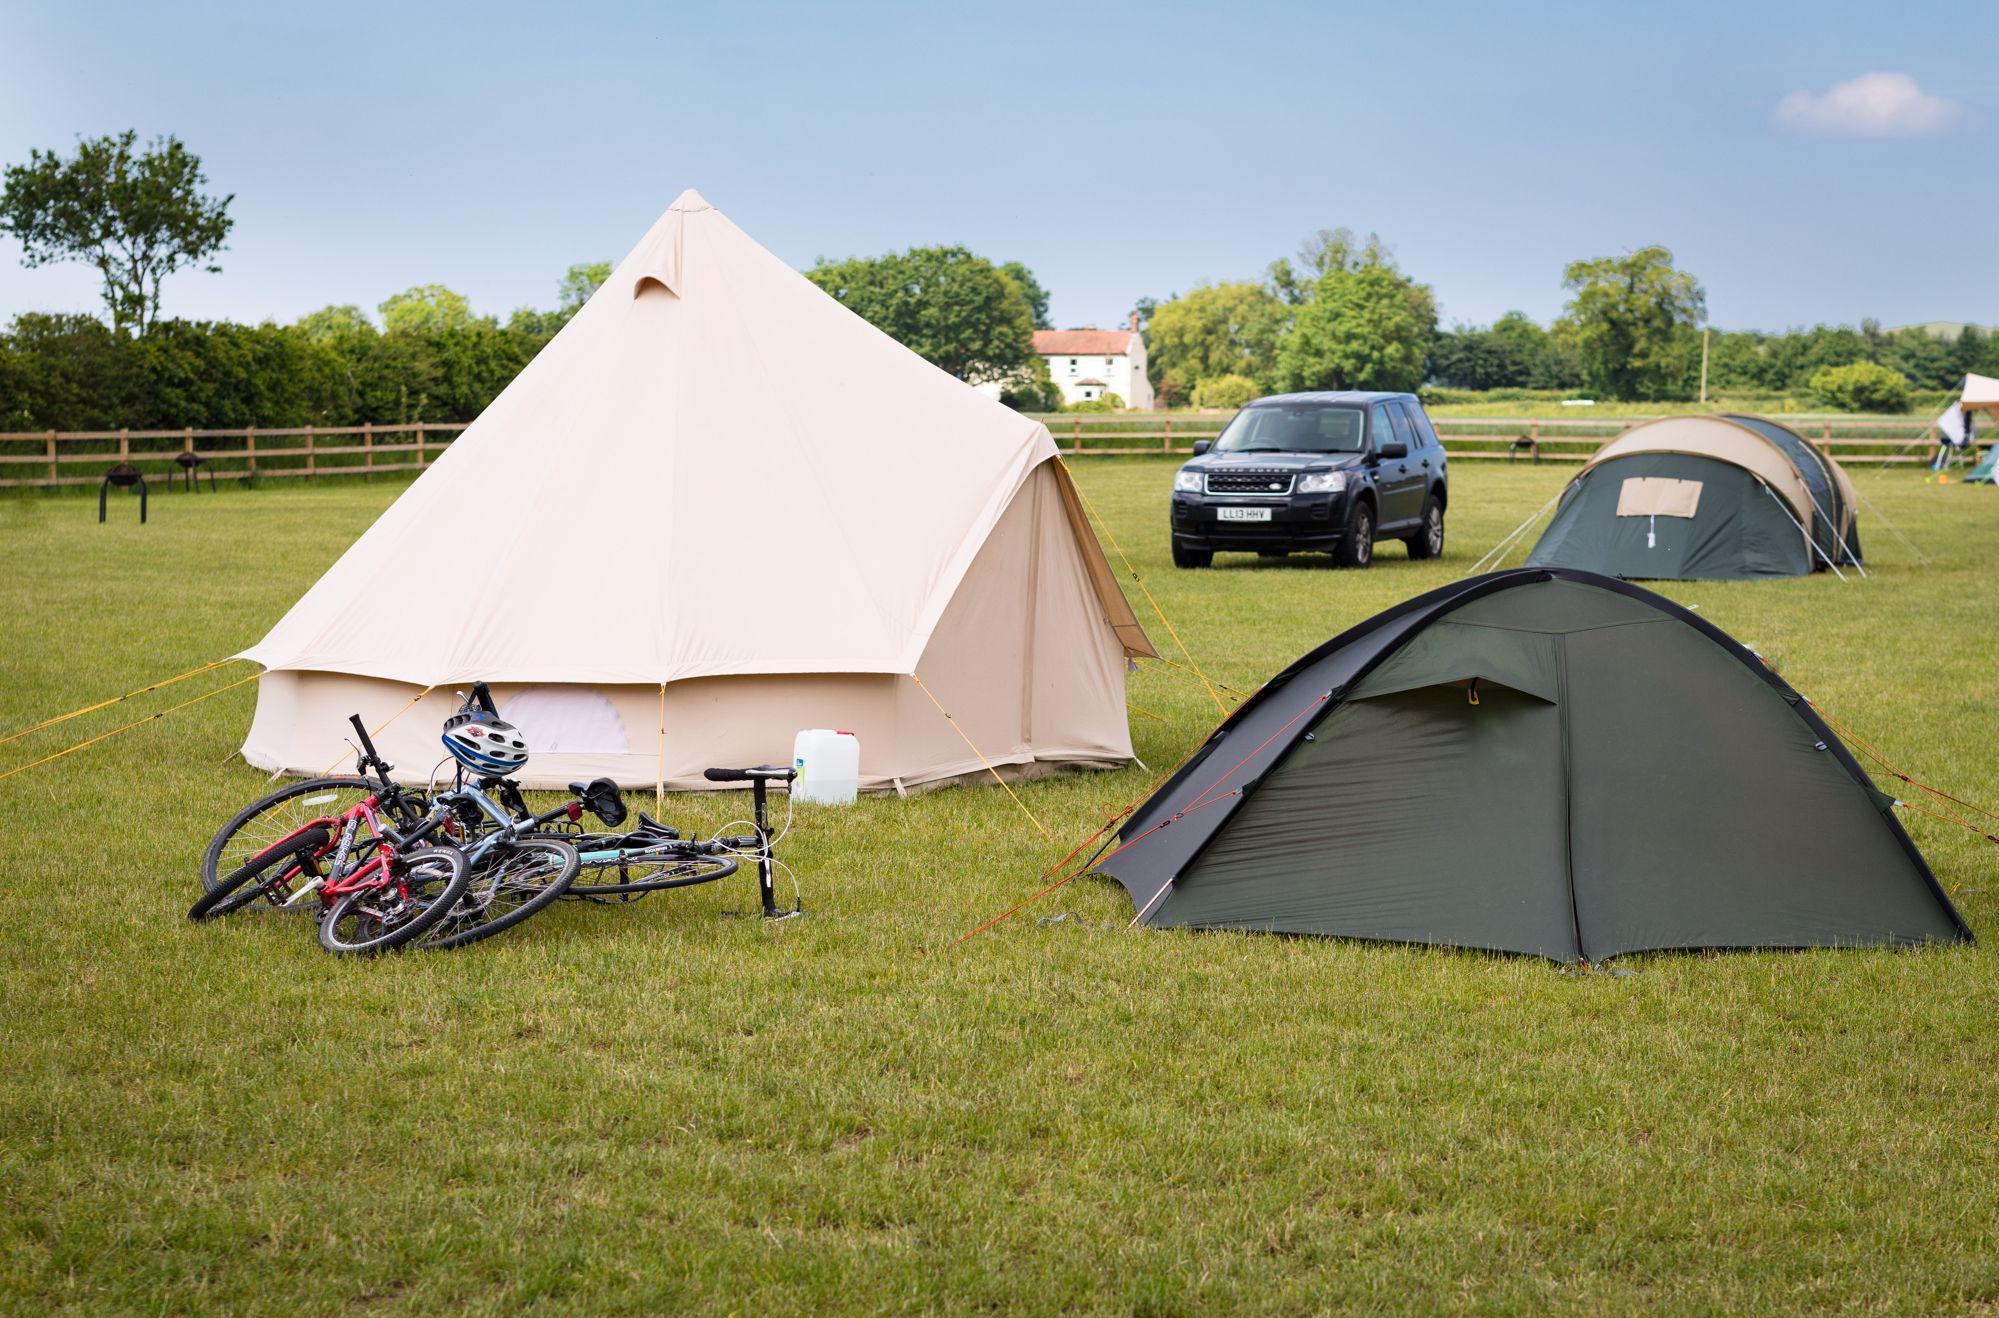 Ferrygate Lane Camping